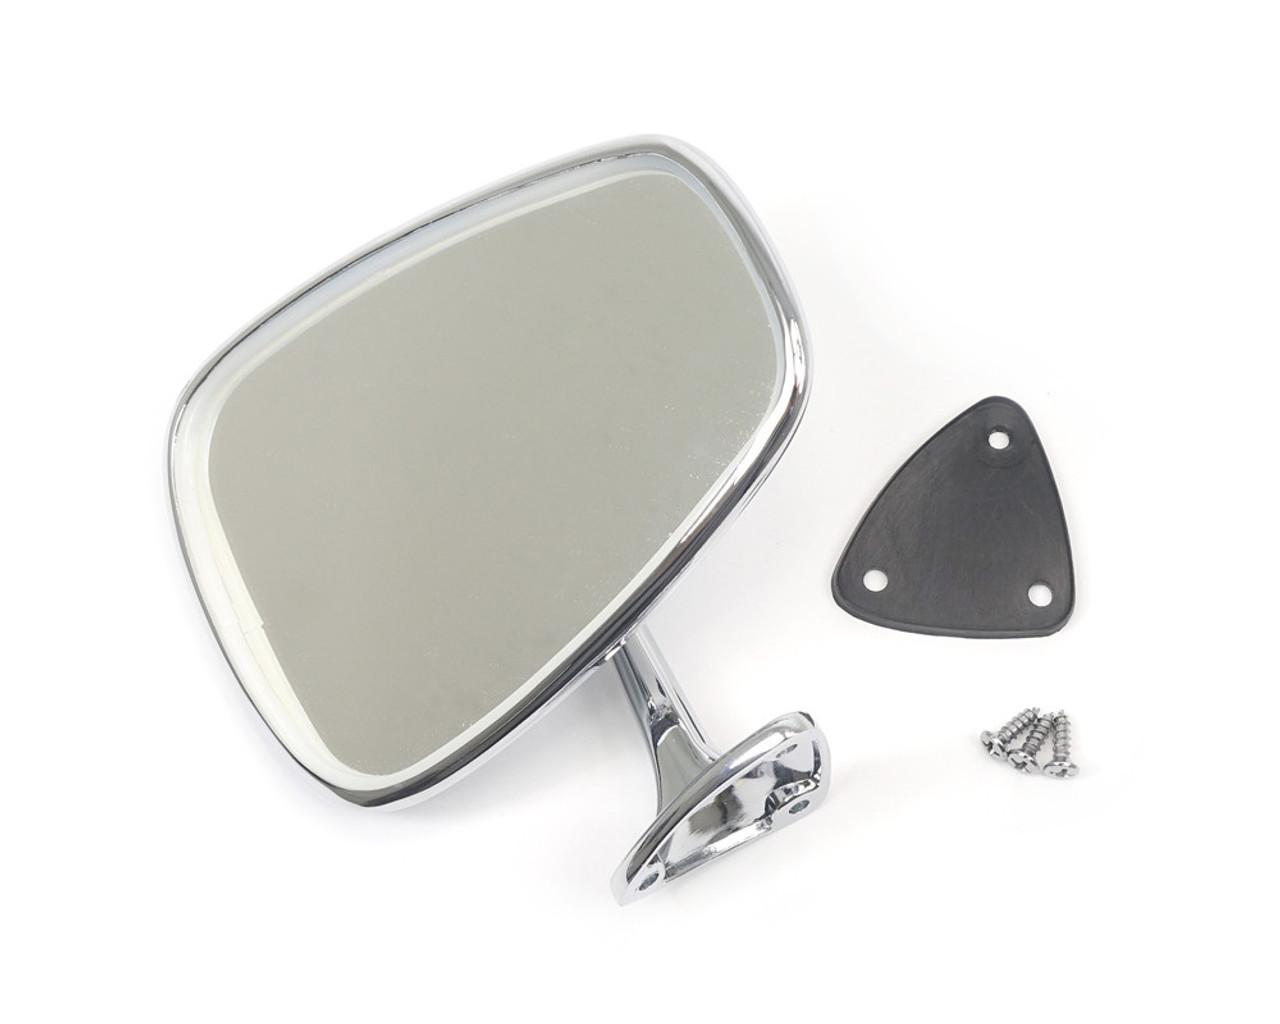 FIAT 124 Vitaloni Chrome Exterior Mirror - 1966-78 (RE6-081) - Auto Ricambi